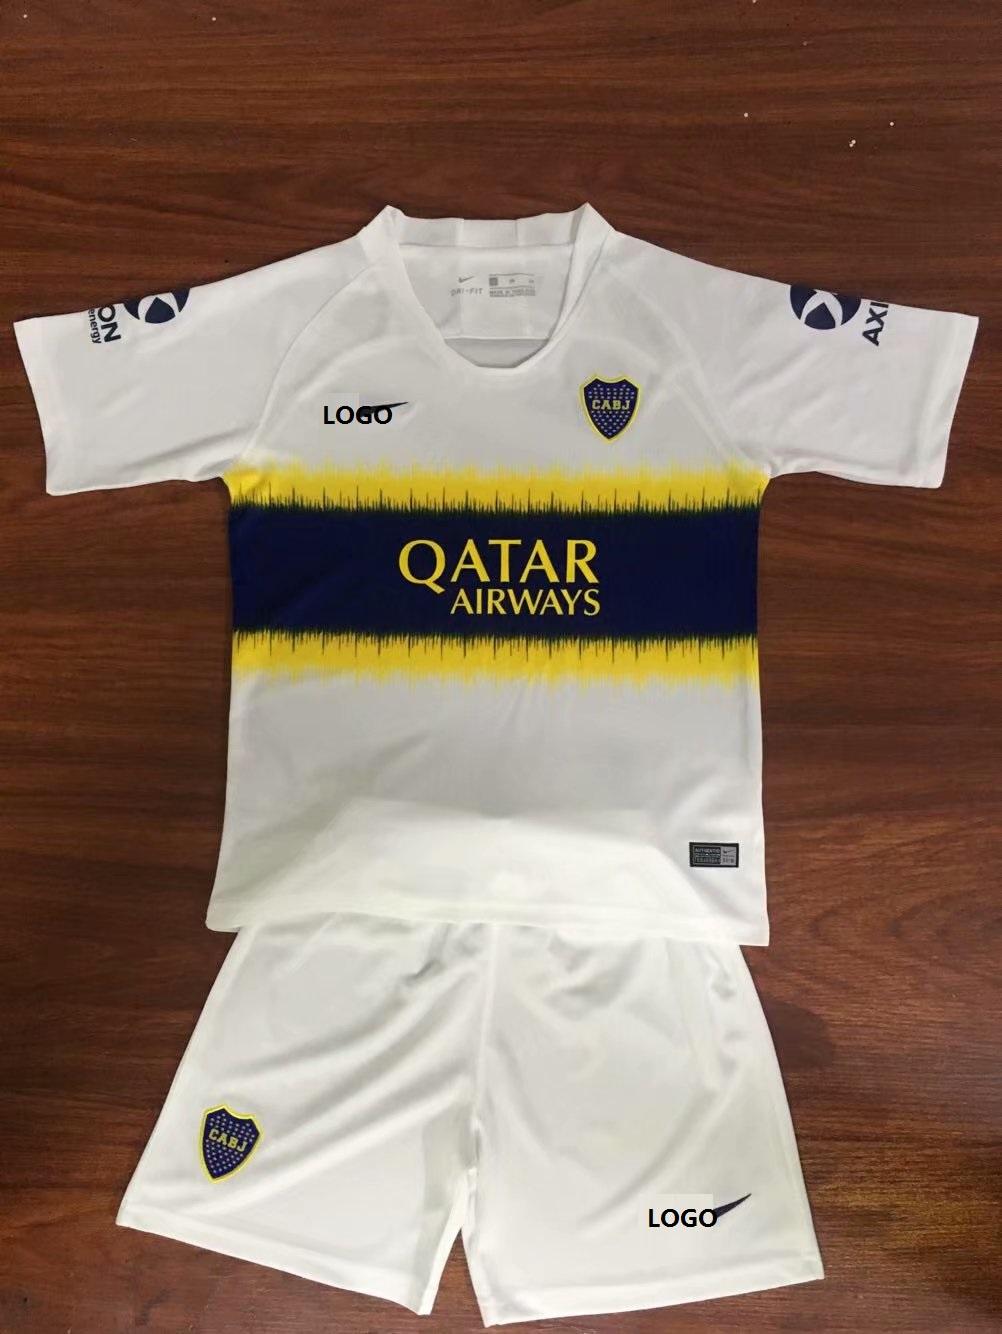 3ac56576623 2019 Kids Club Atlético Boca Away White Soccer Jersey Uniforms Kits  Wholesale